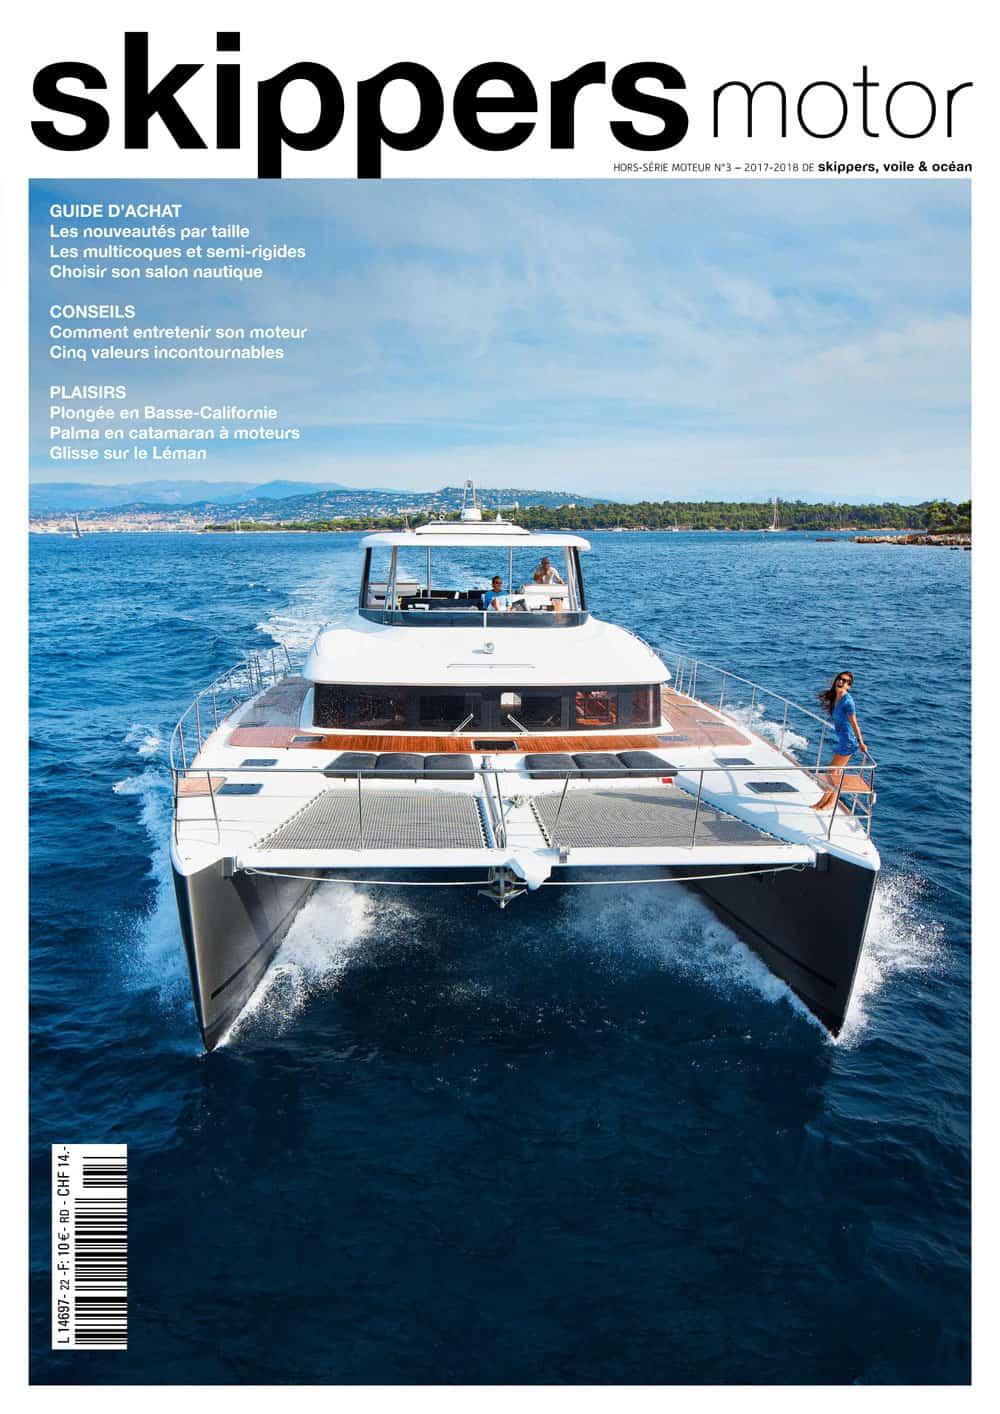 Skippers-Motor-No-3---FR_BD